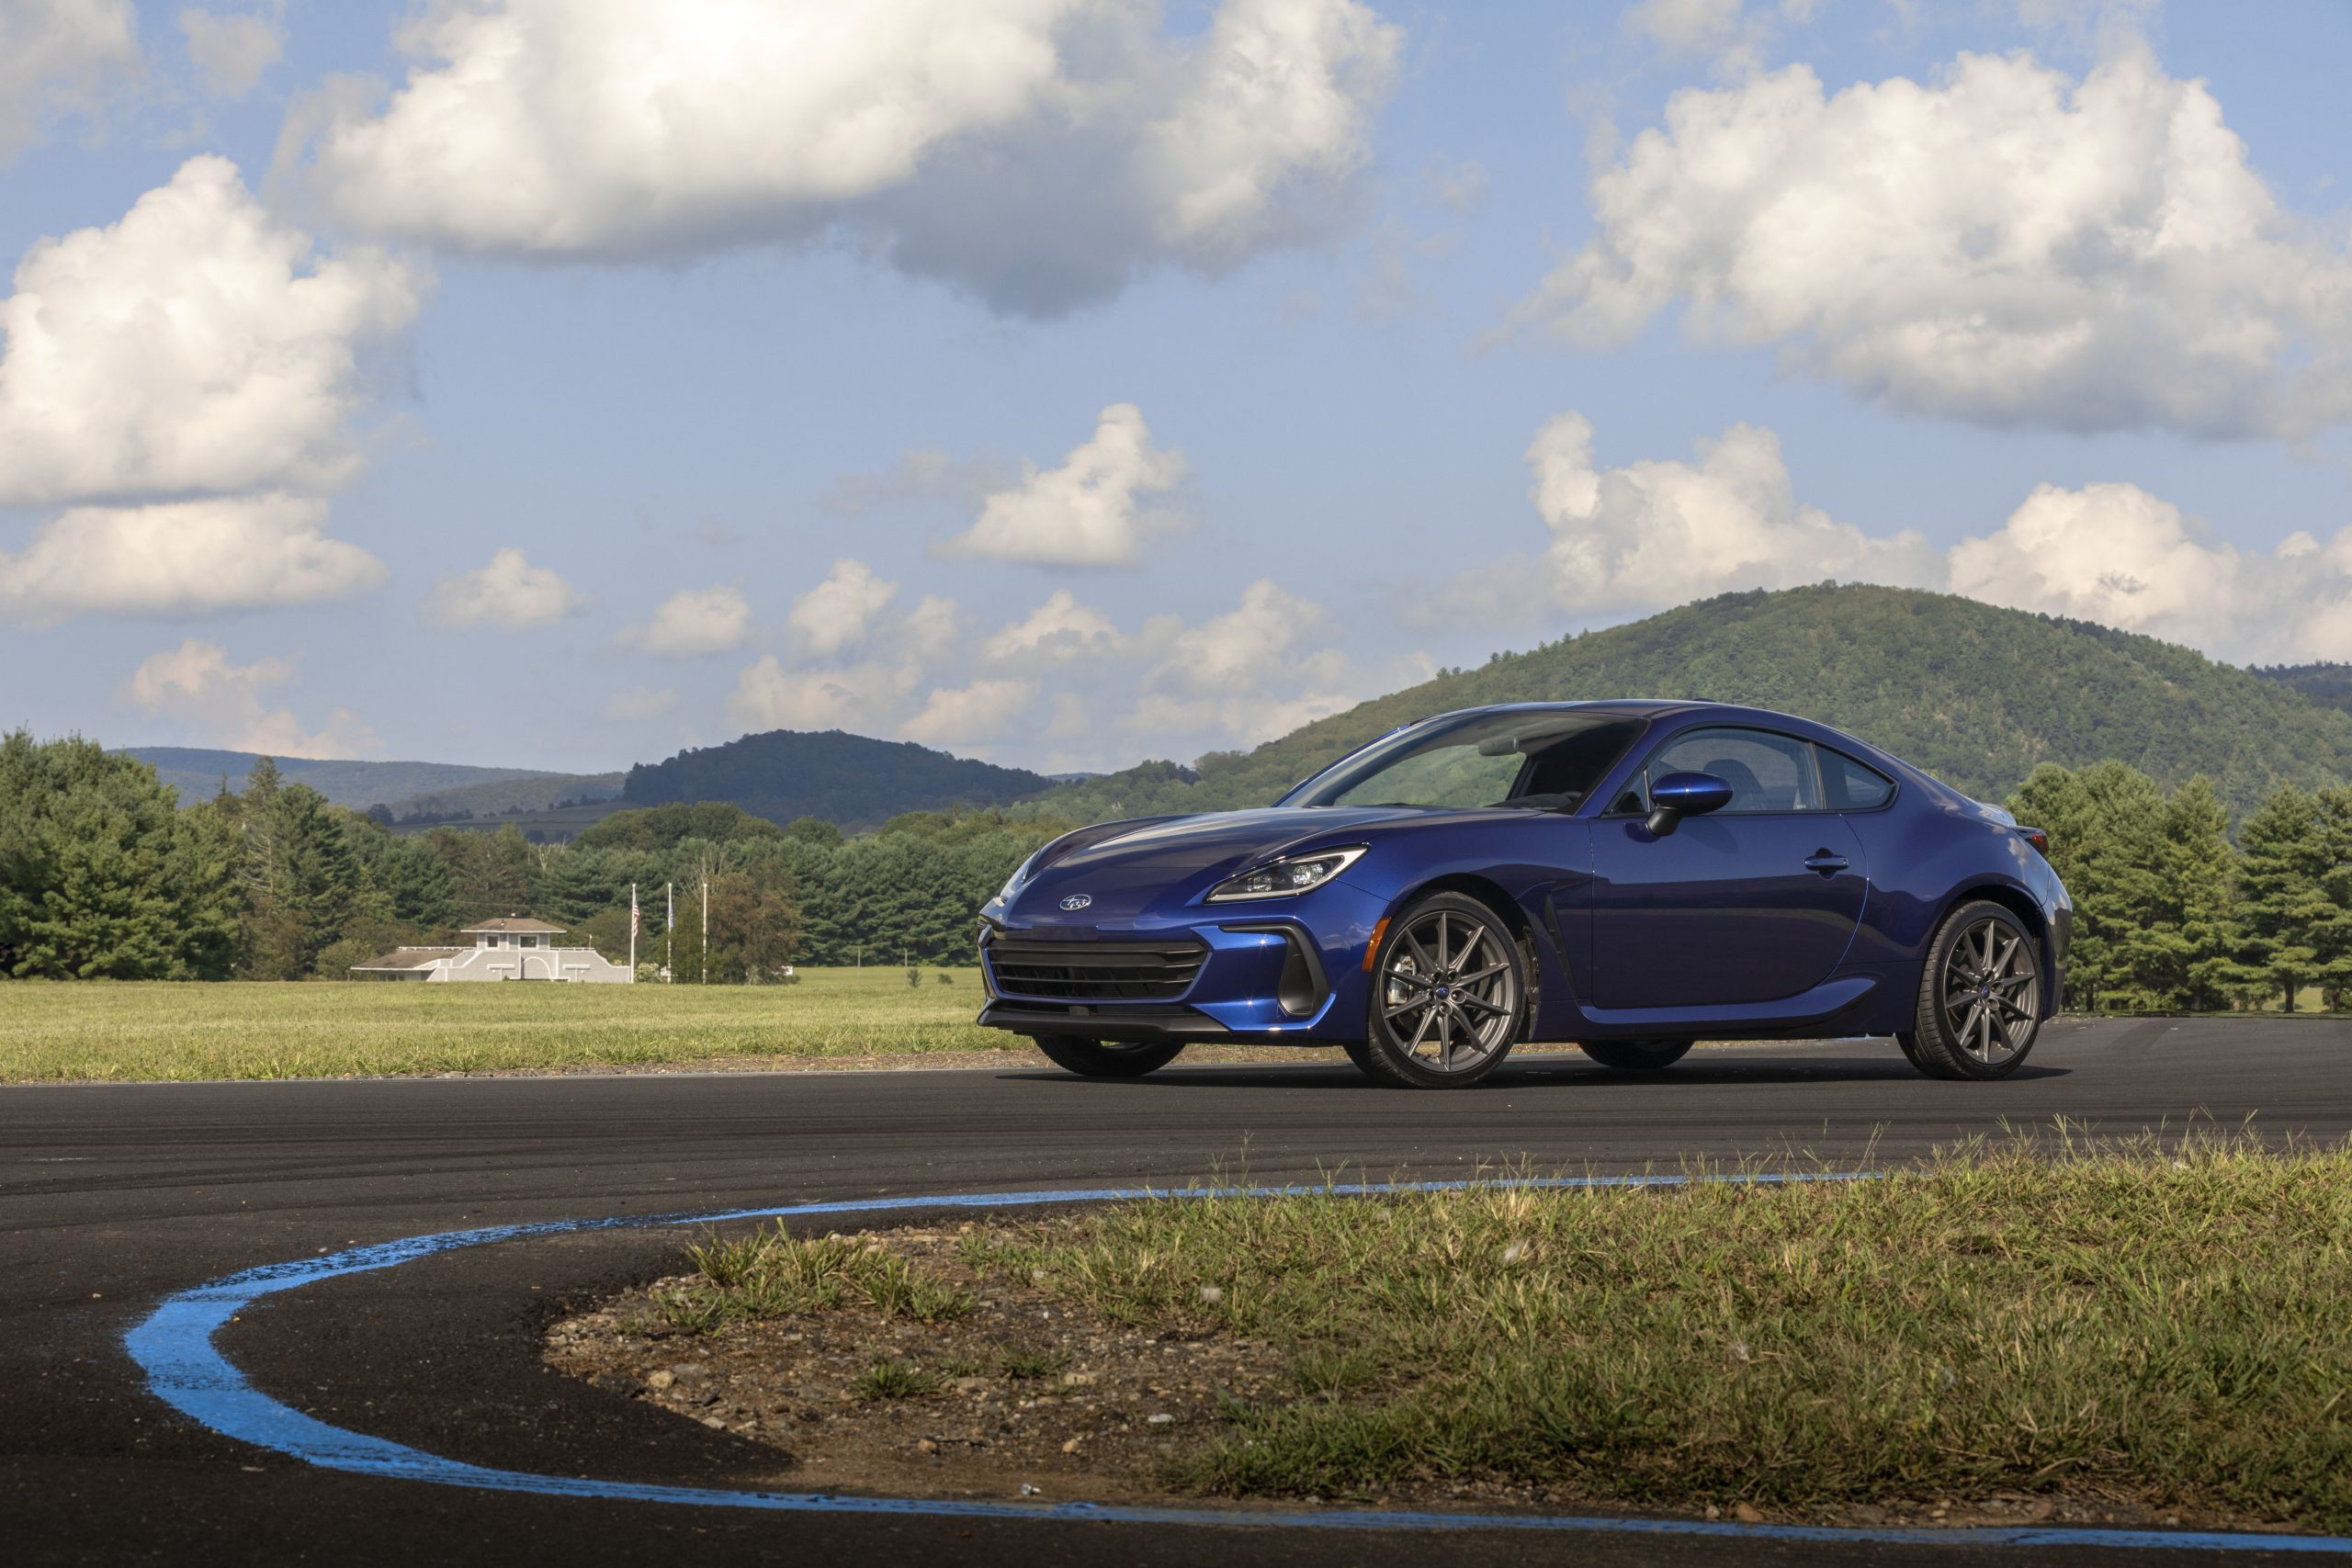 2022 Subaru BRZ front three-quarter